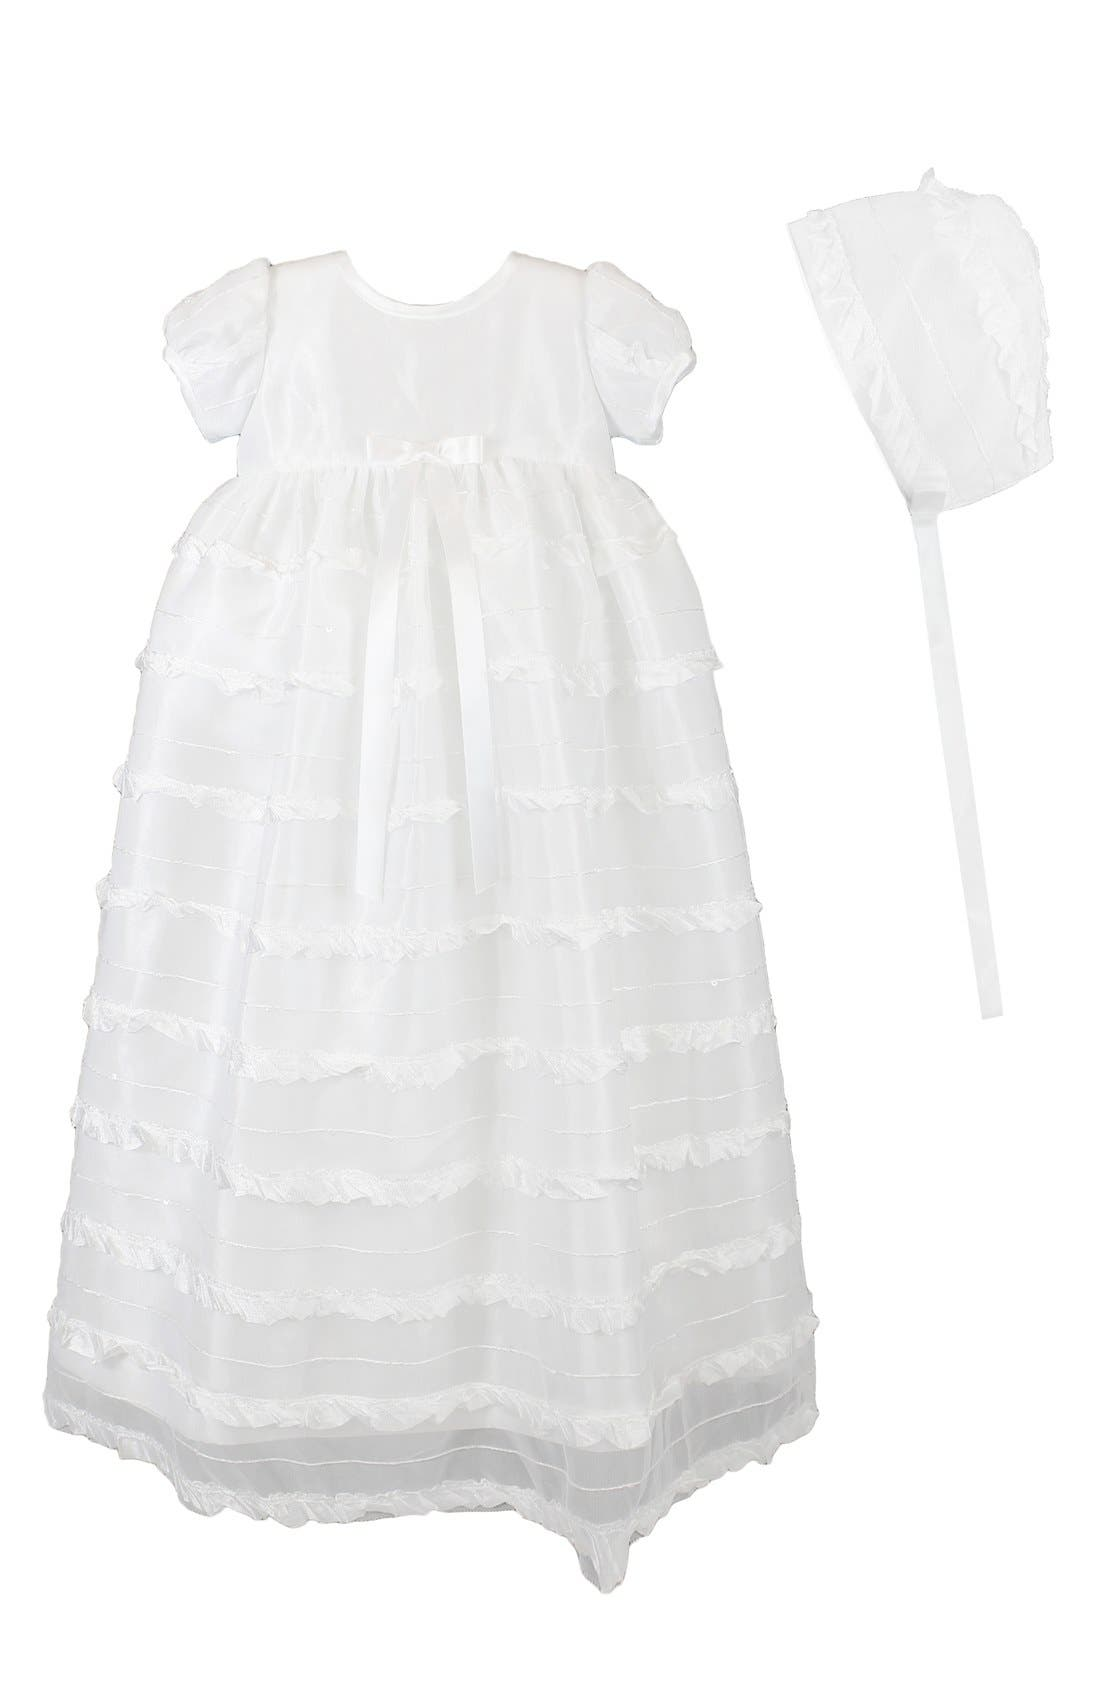 C.I. Castro & Co 'Eyelash' Christening Gown & Bonnet (Baby Girls)